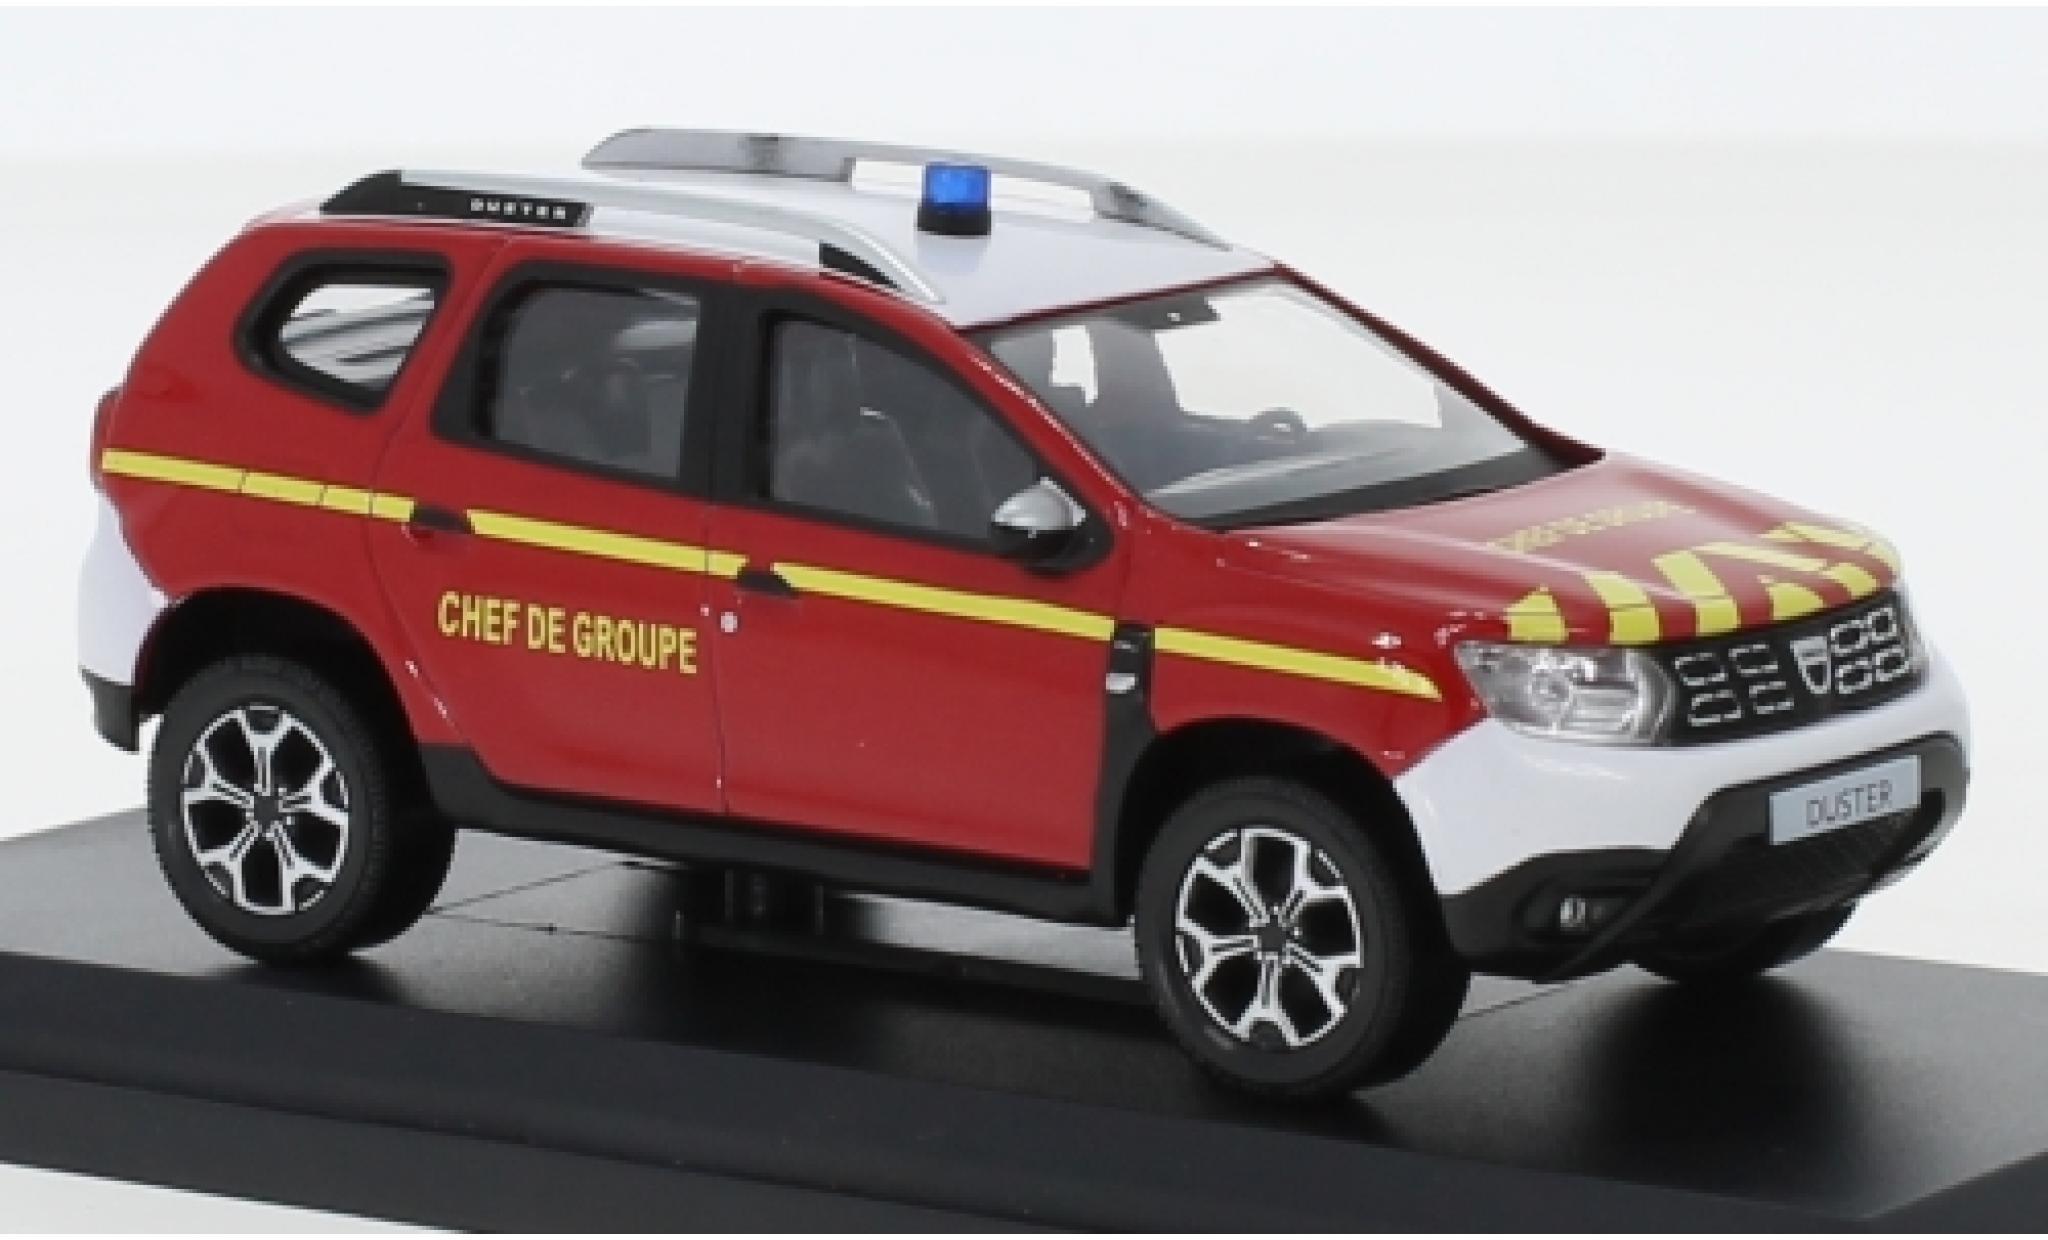 Dacia Duster 1/43 Norev Pompiers - Chef de Groupe 2018